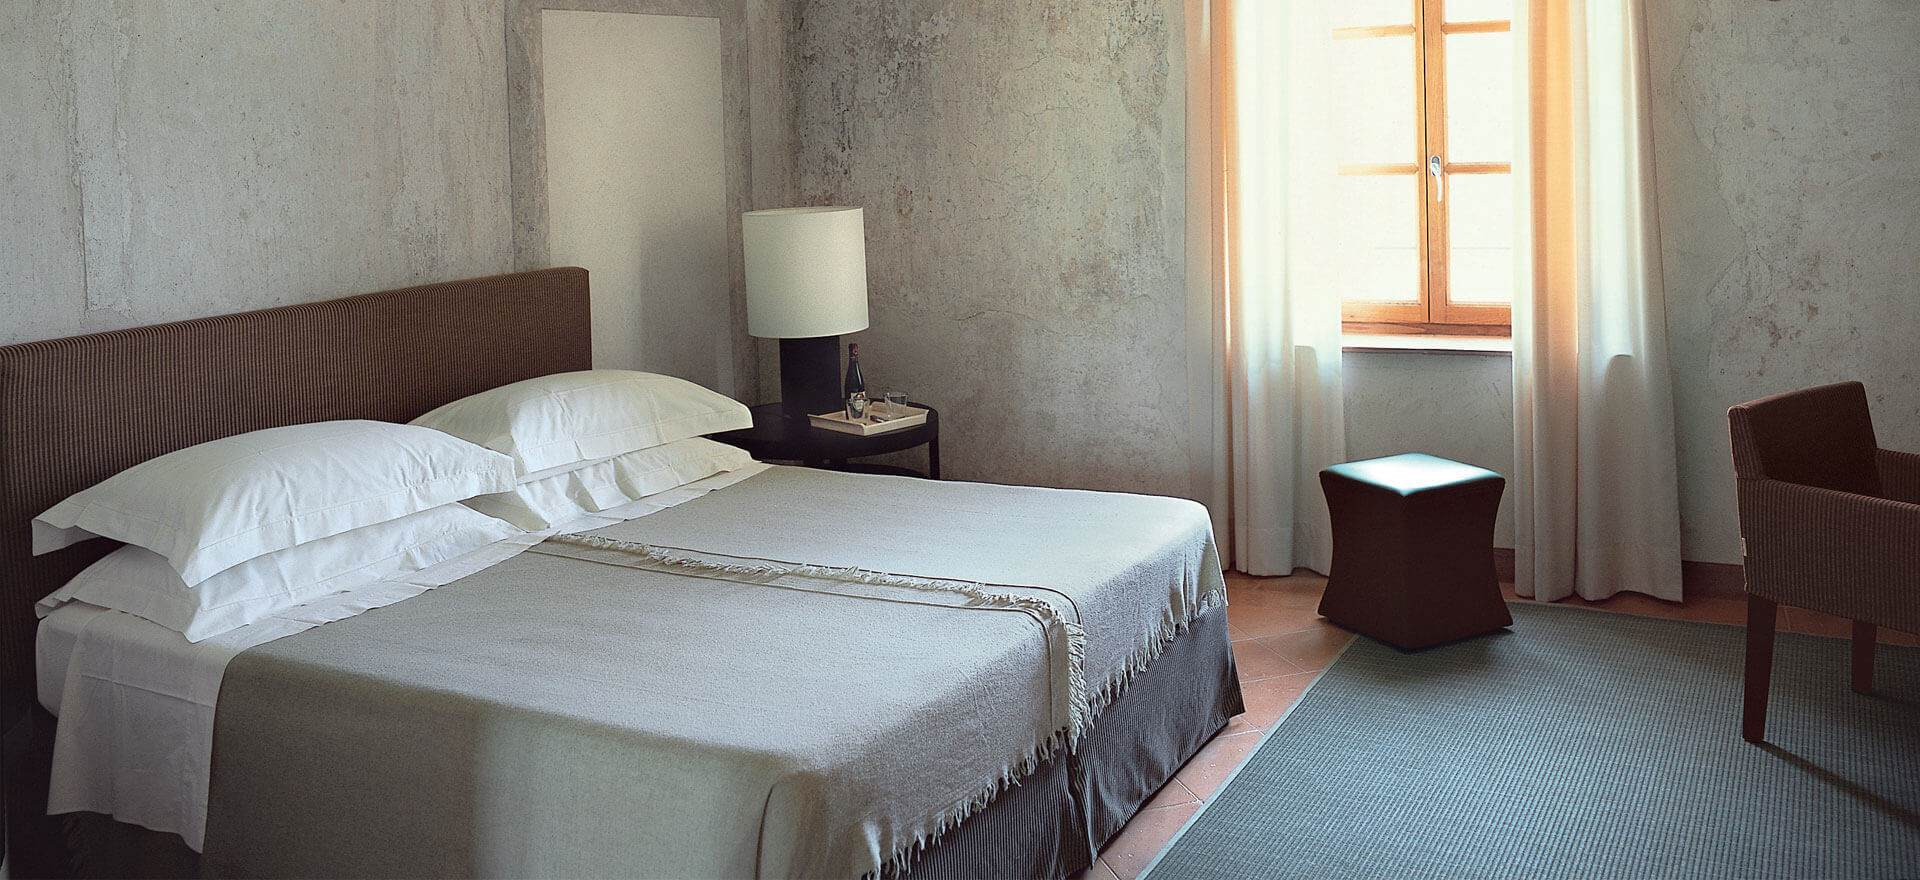 zimmer hotel villa arcadio sal. Black Bedroom Furniture Sets. Home Design Ideas